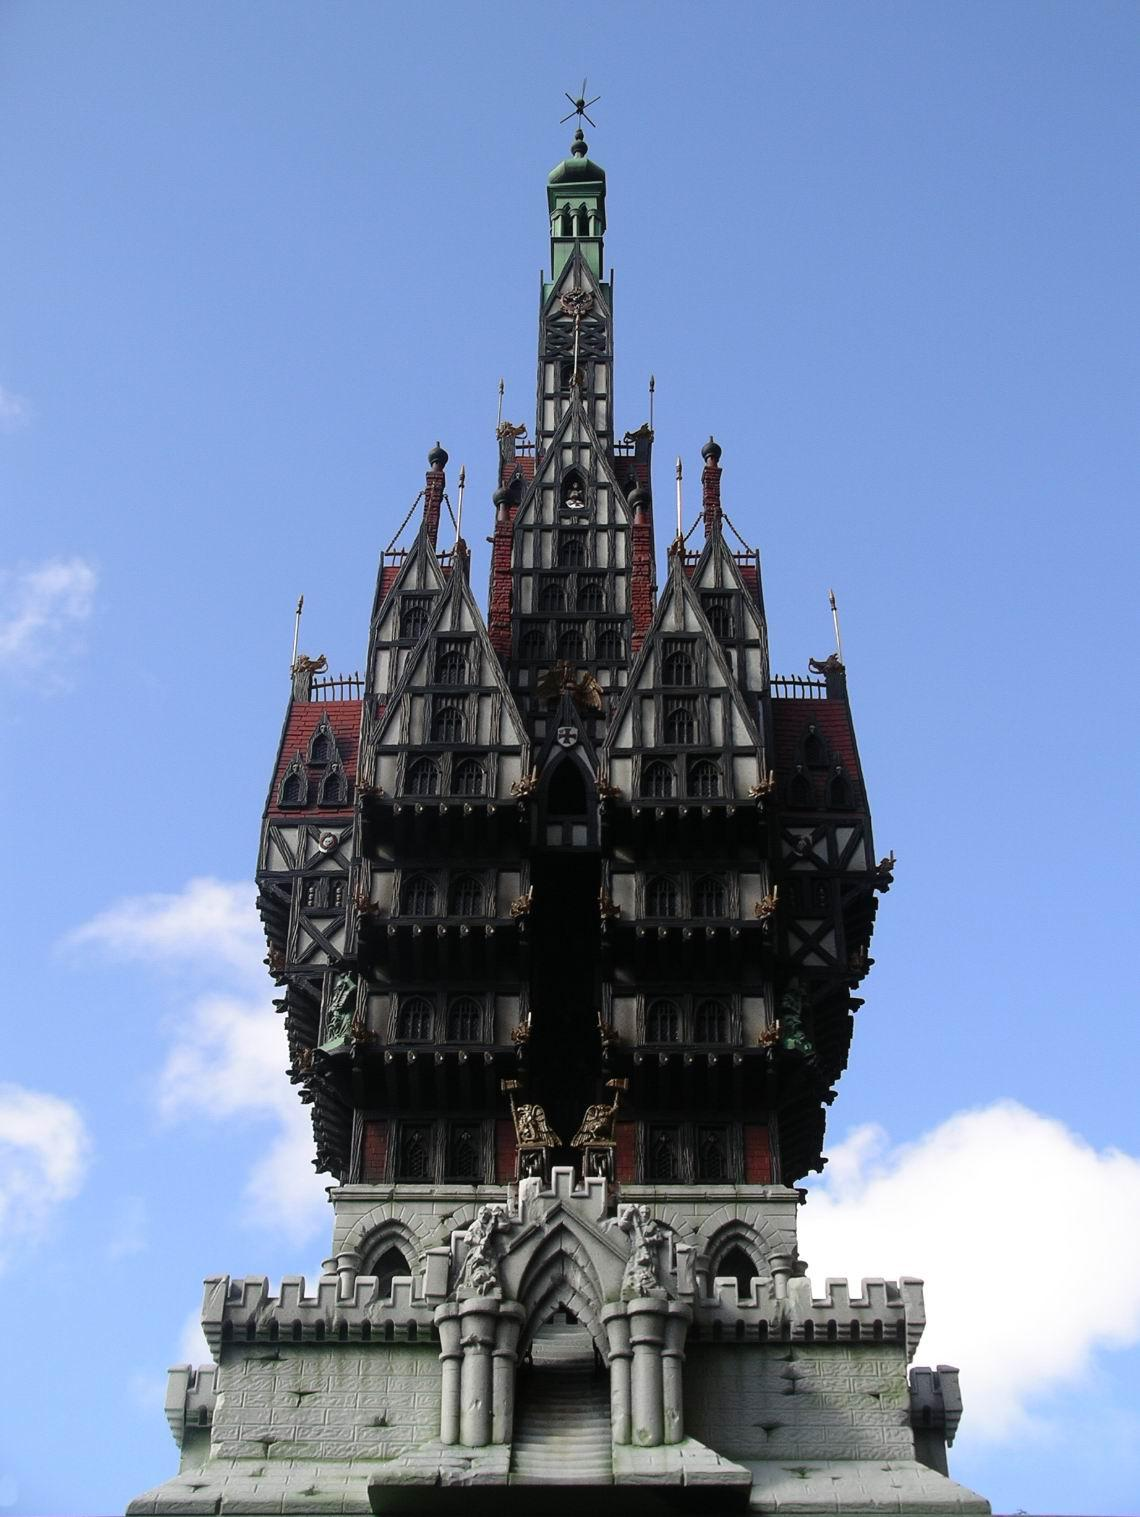 Buildings, Huge, Terrain, The Burgomeister's Mansion, The Burgomeisters Mansion, Warhammer Fantasy